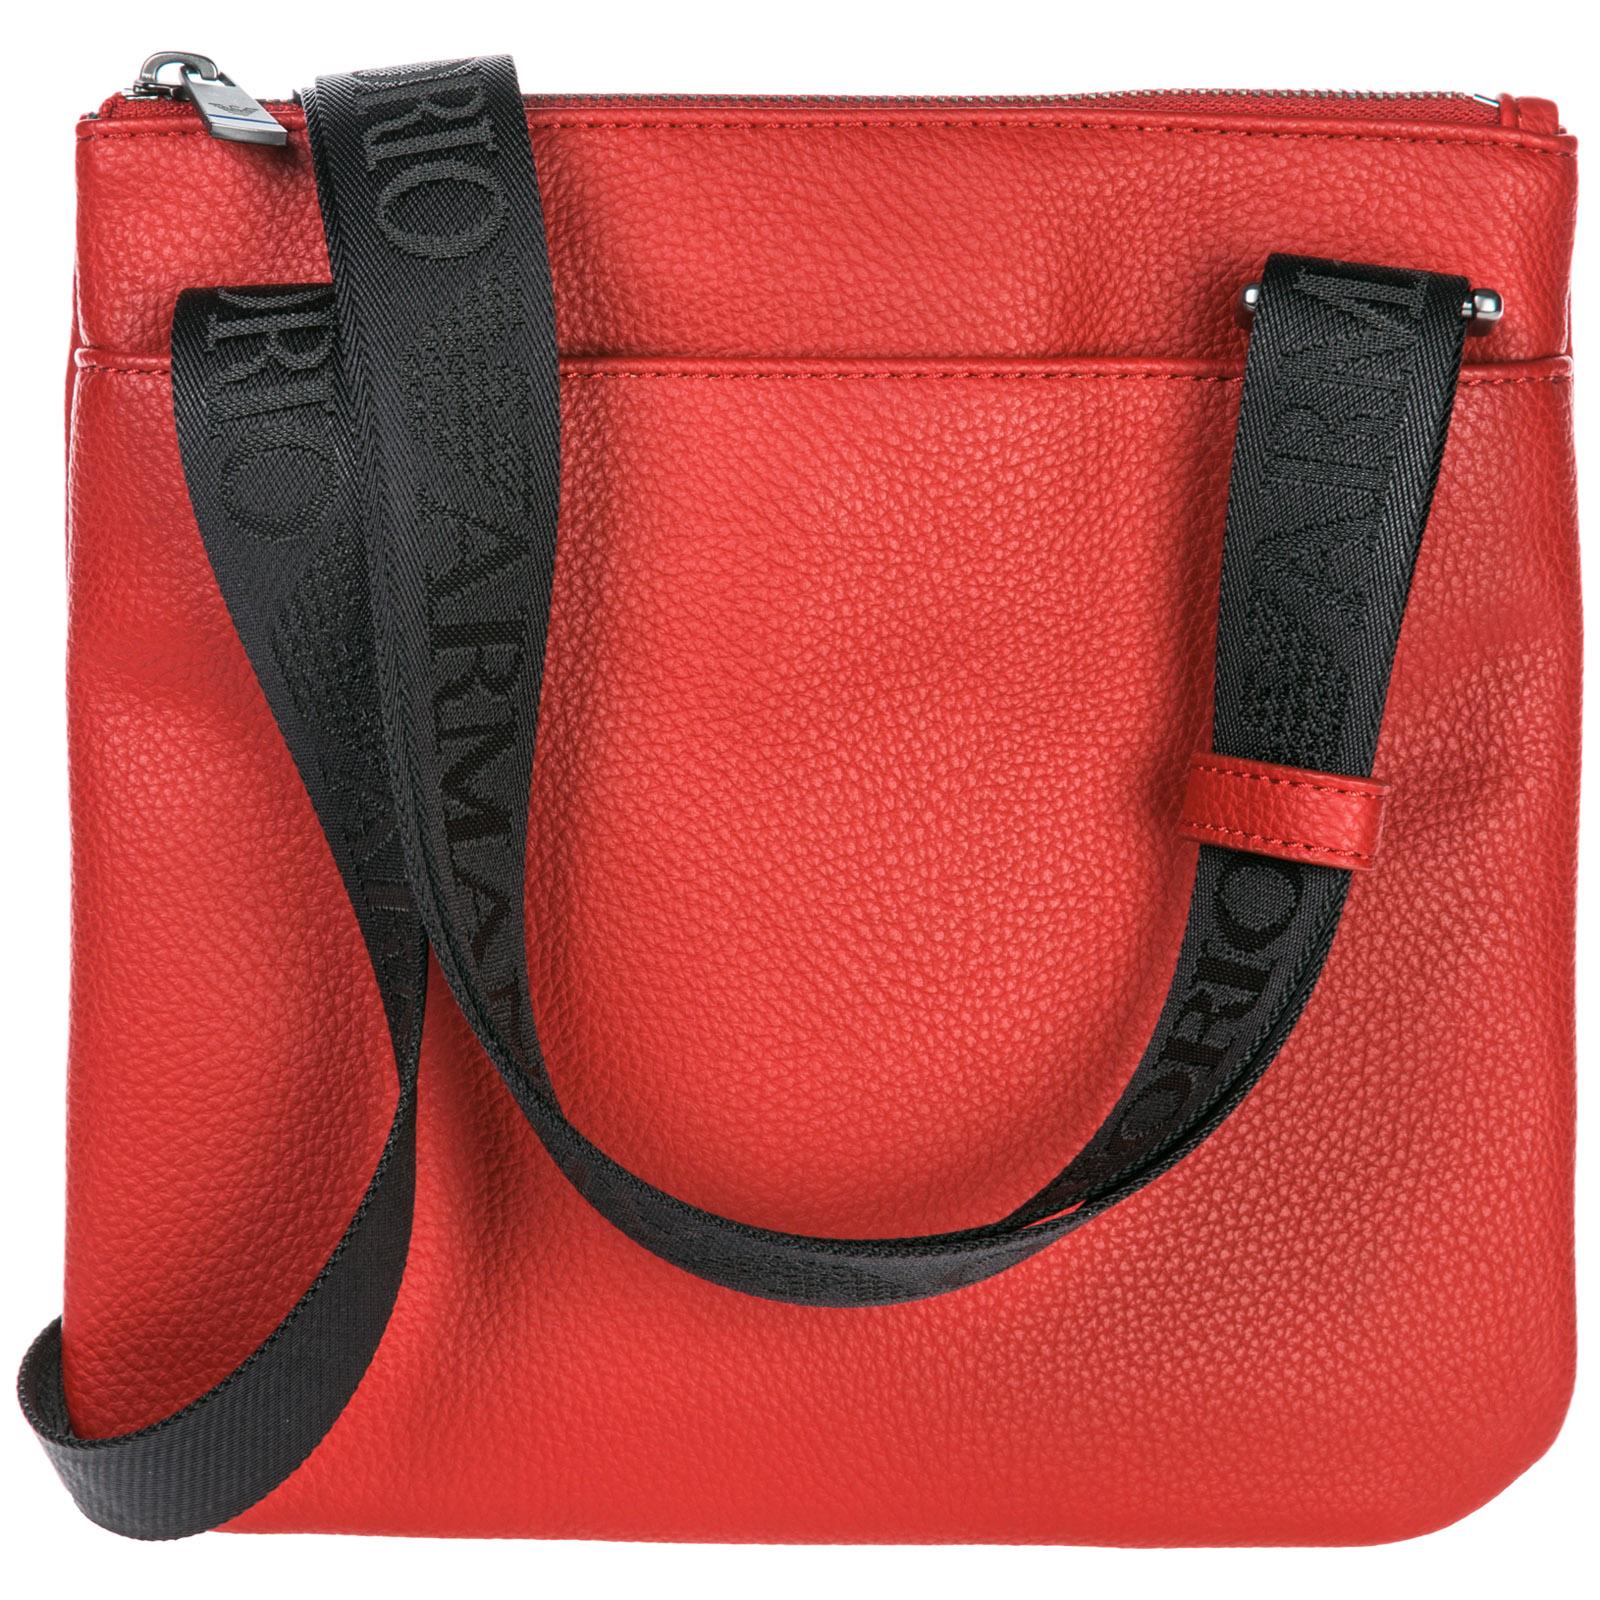 Men's cross-body messenger shoulder bag